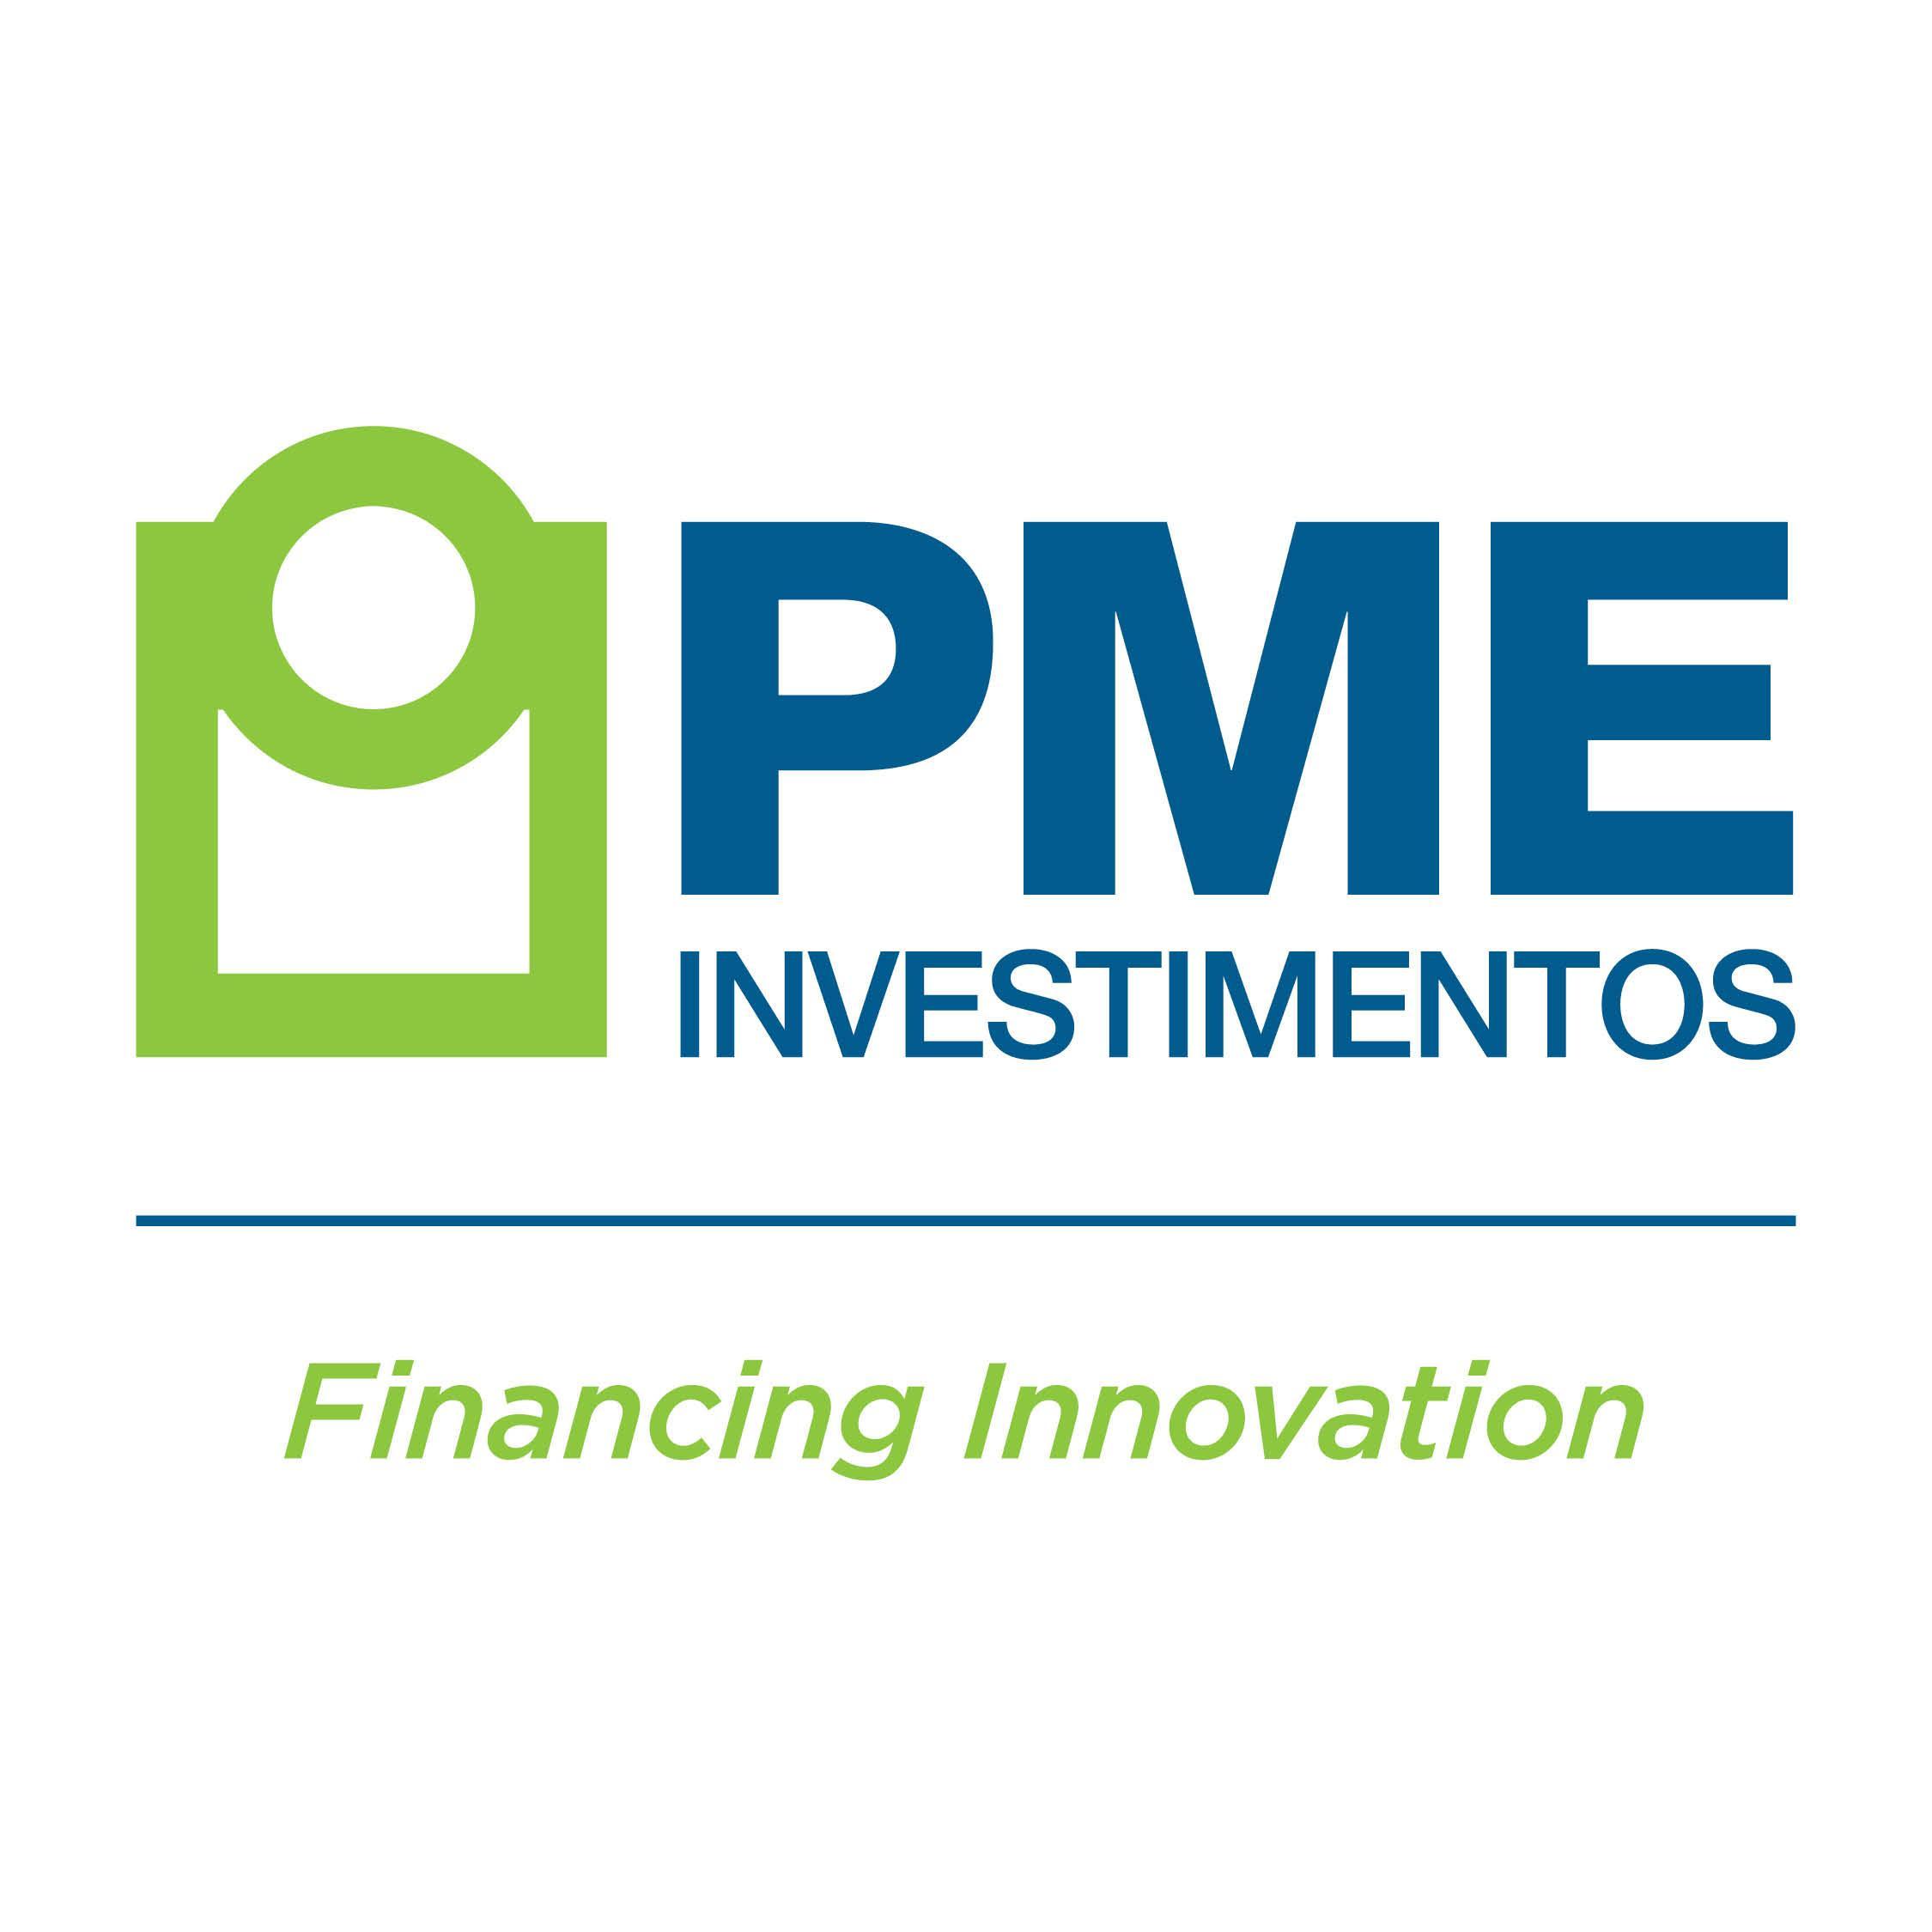 Logotipo PME Investimentos - Sociedade de Investimento, S.A. - ePortugal.gov.pt